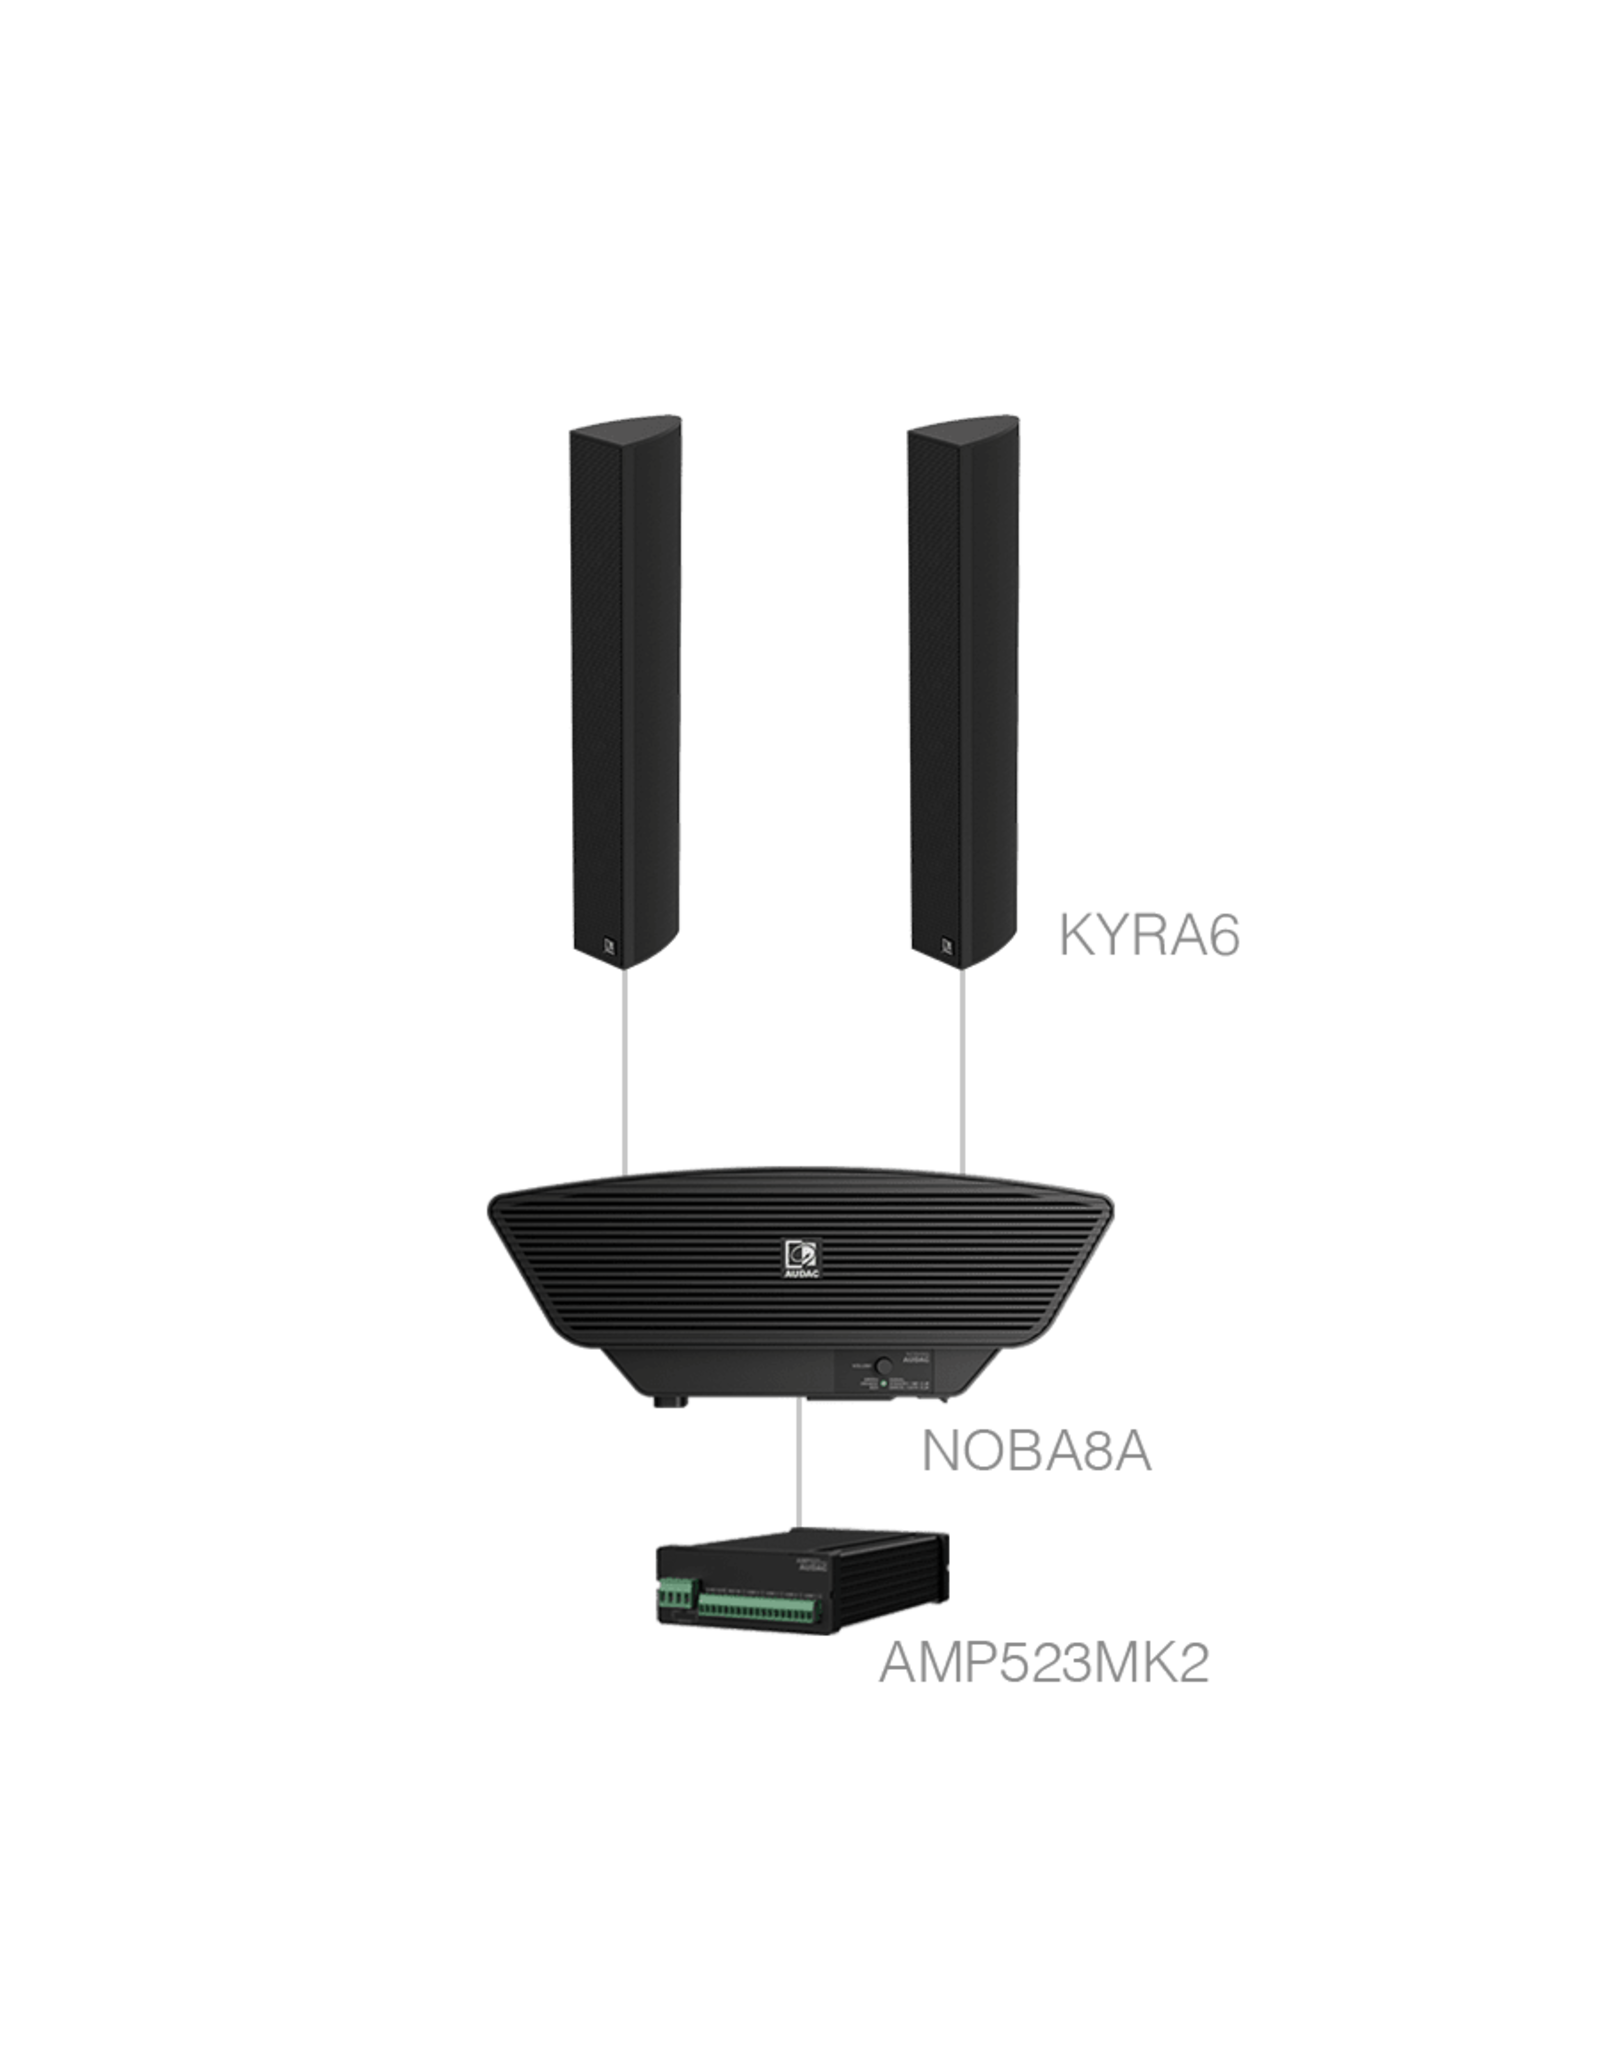 Audac 2 x KYRA6 + NOBA8A + AMP523MK2 Black